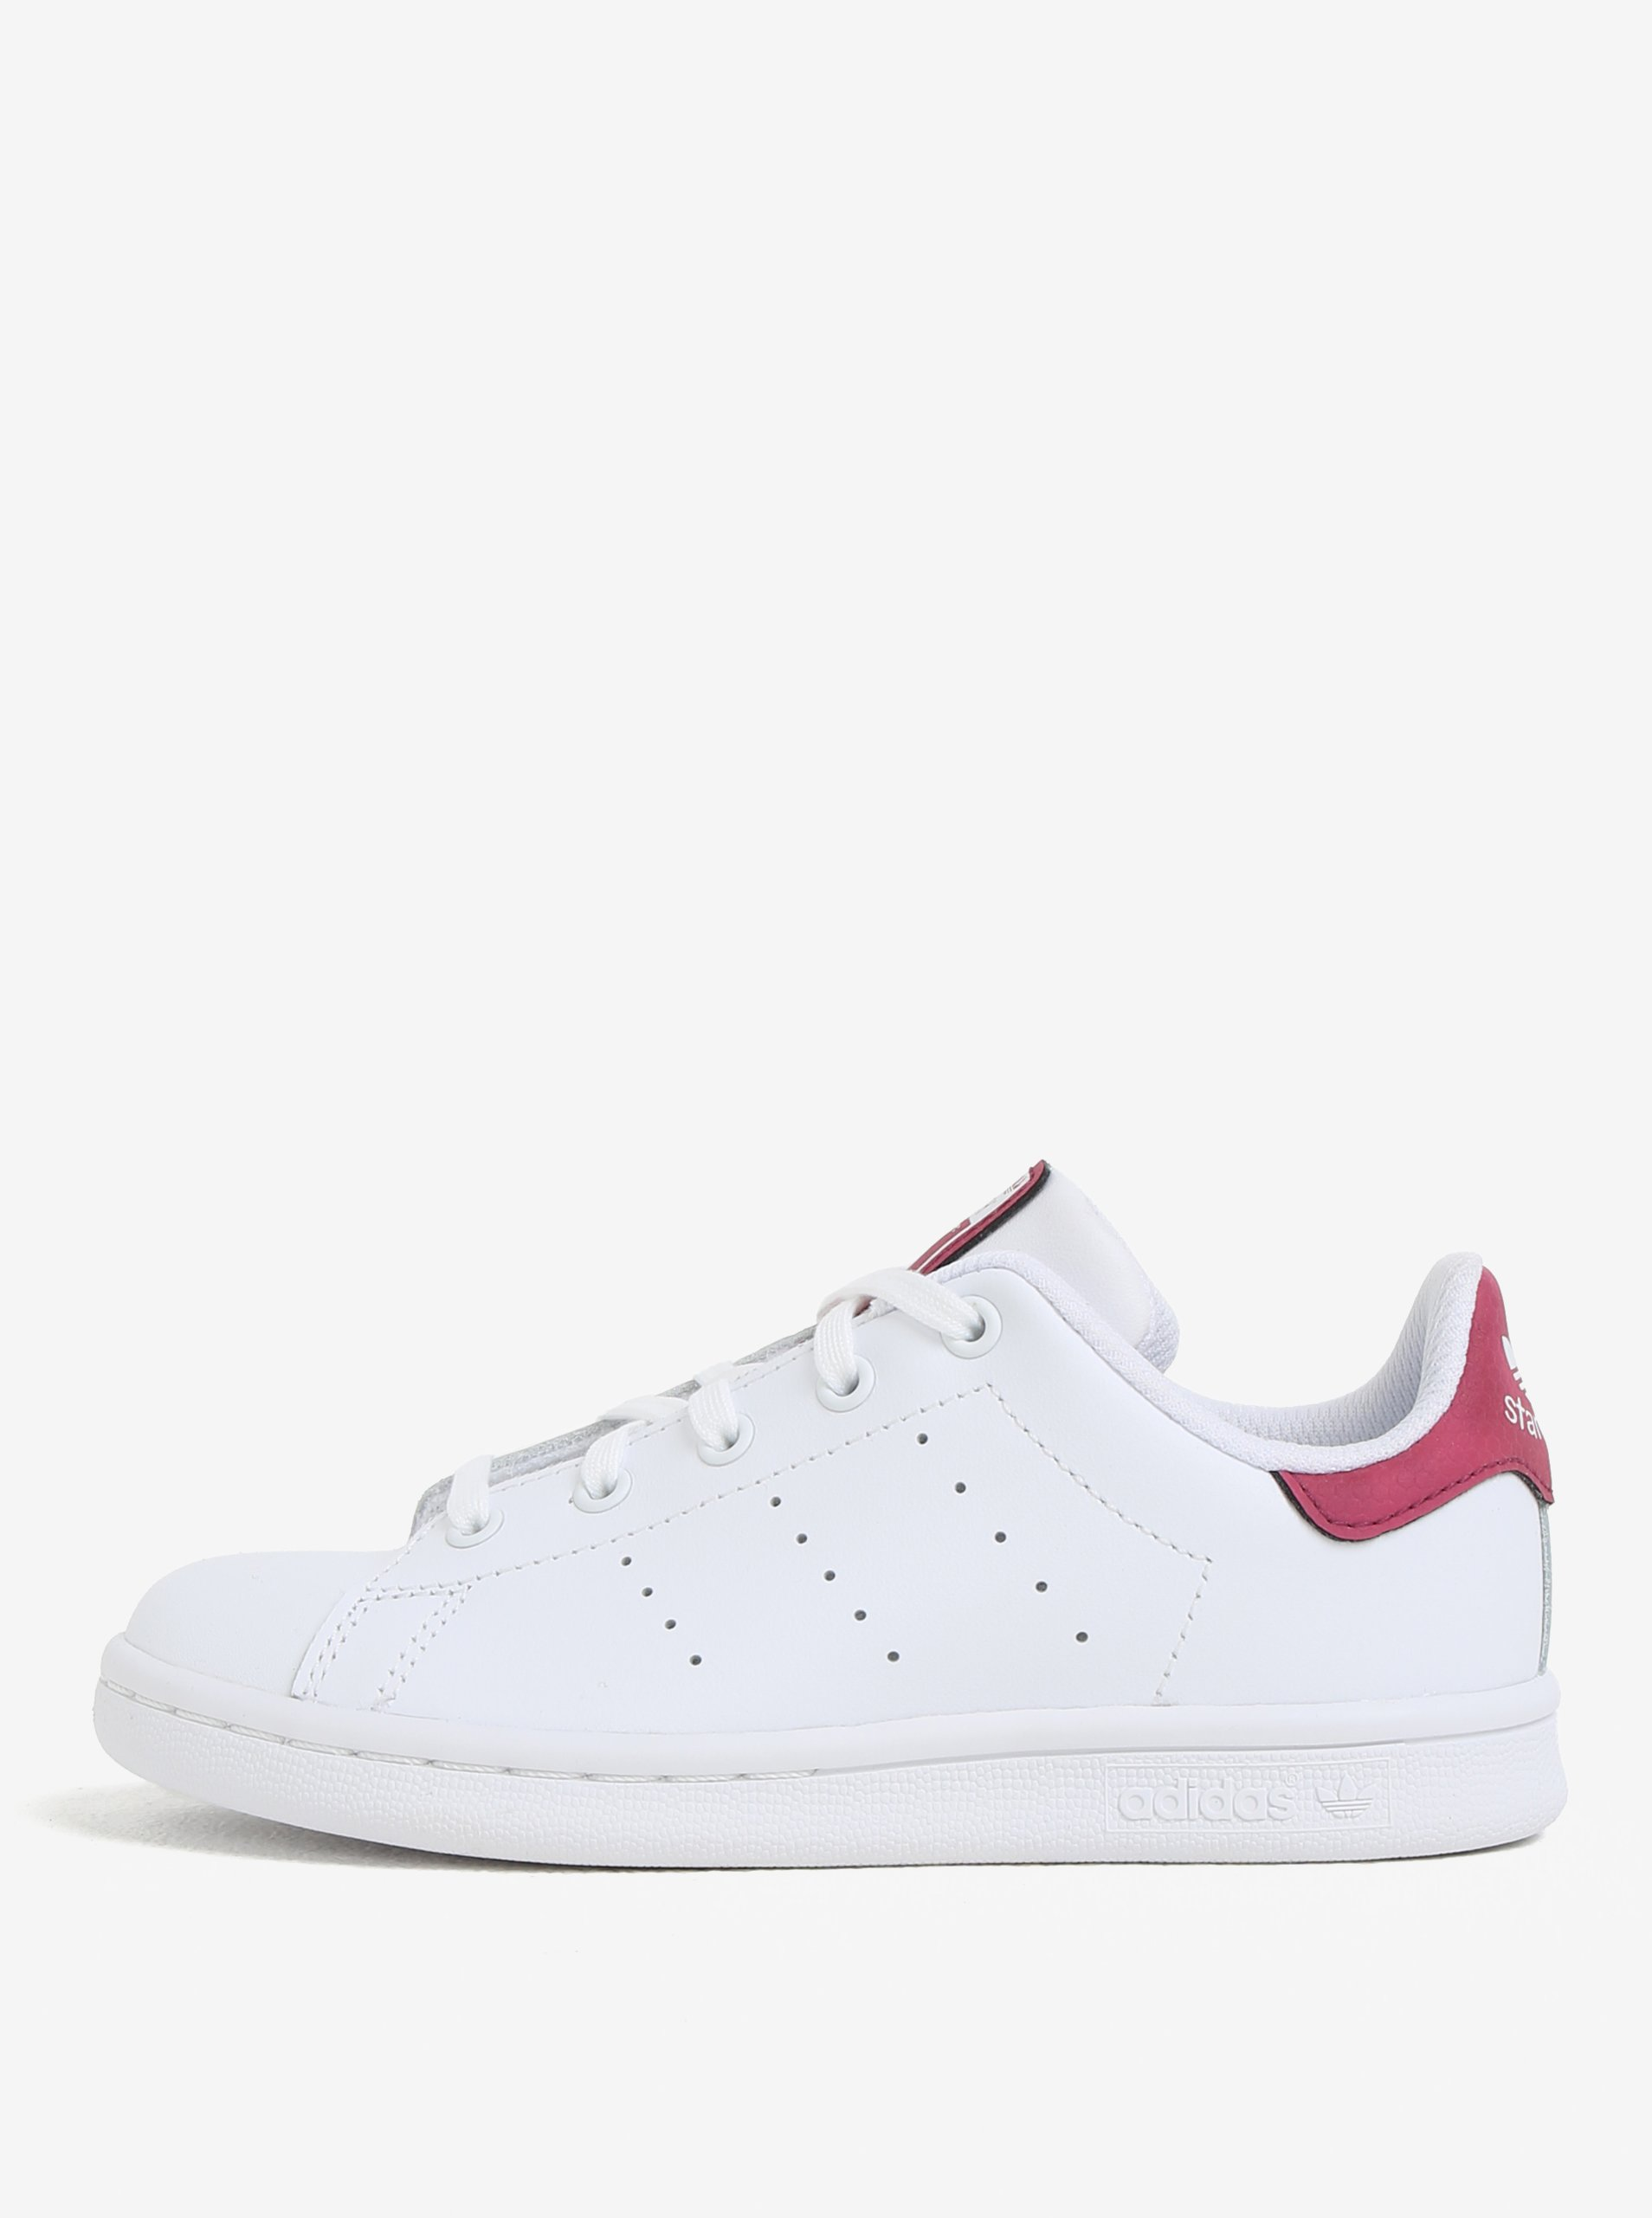 c4852632023 Ružovo-biele detské kožené tenisky adidas Originals Stan Smith C